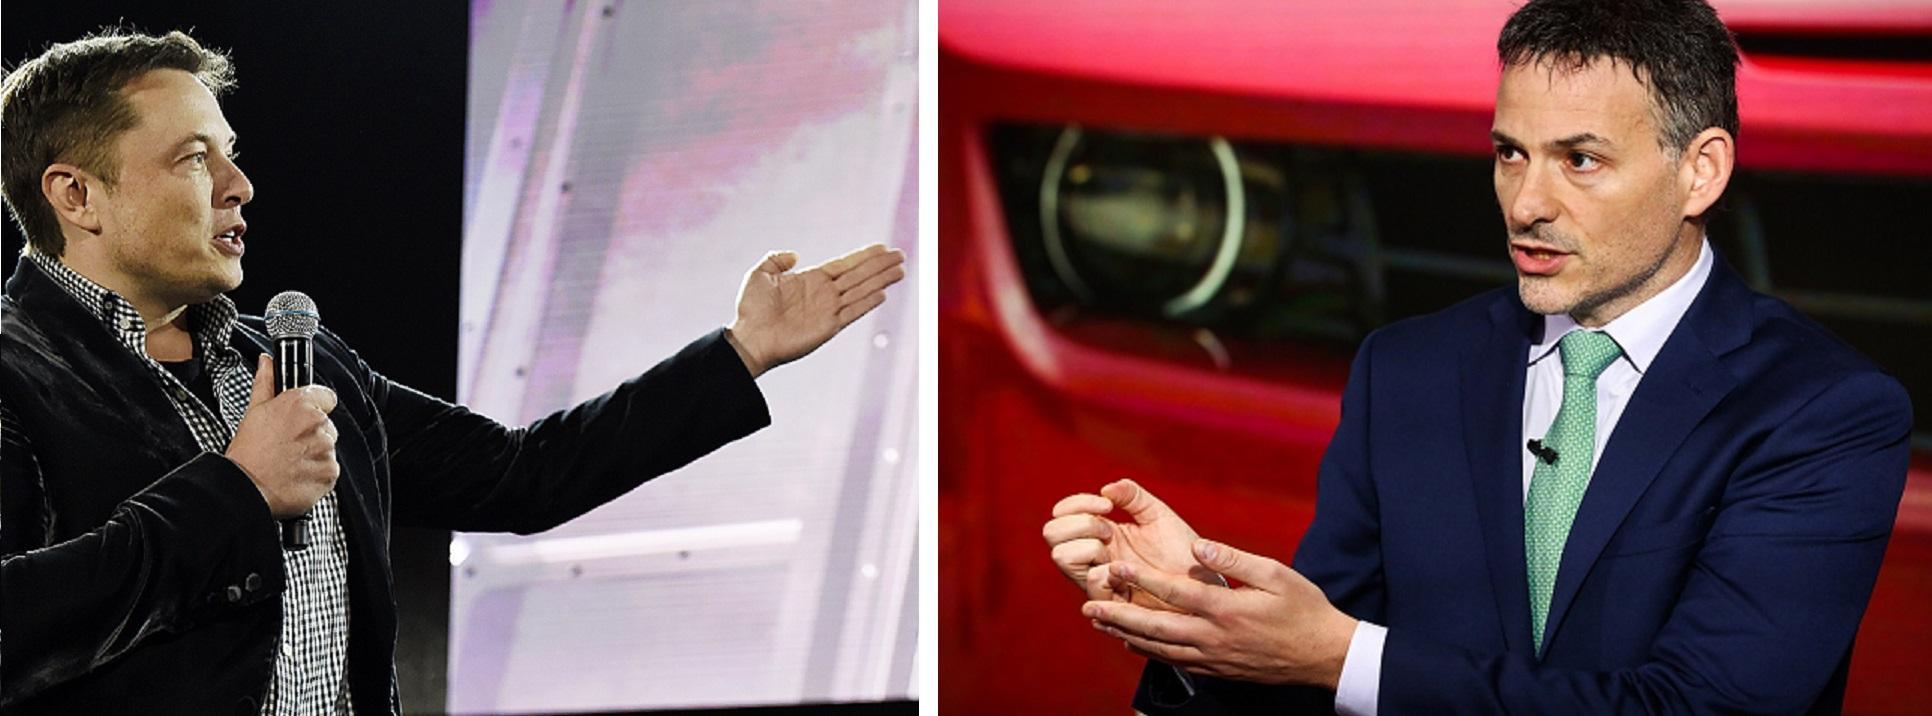 bloomberg.com - Nir Kaissar - David Einhorn Goes Mano a Mano With Elon Musk